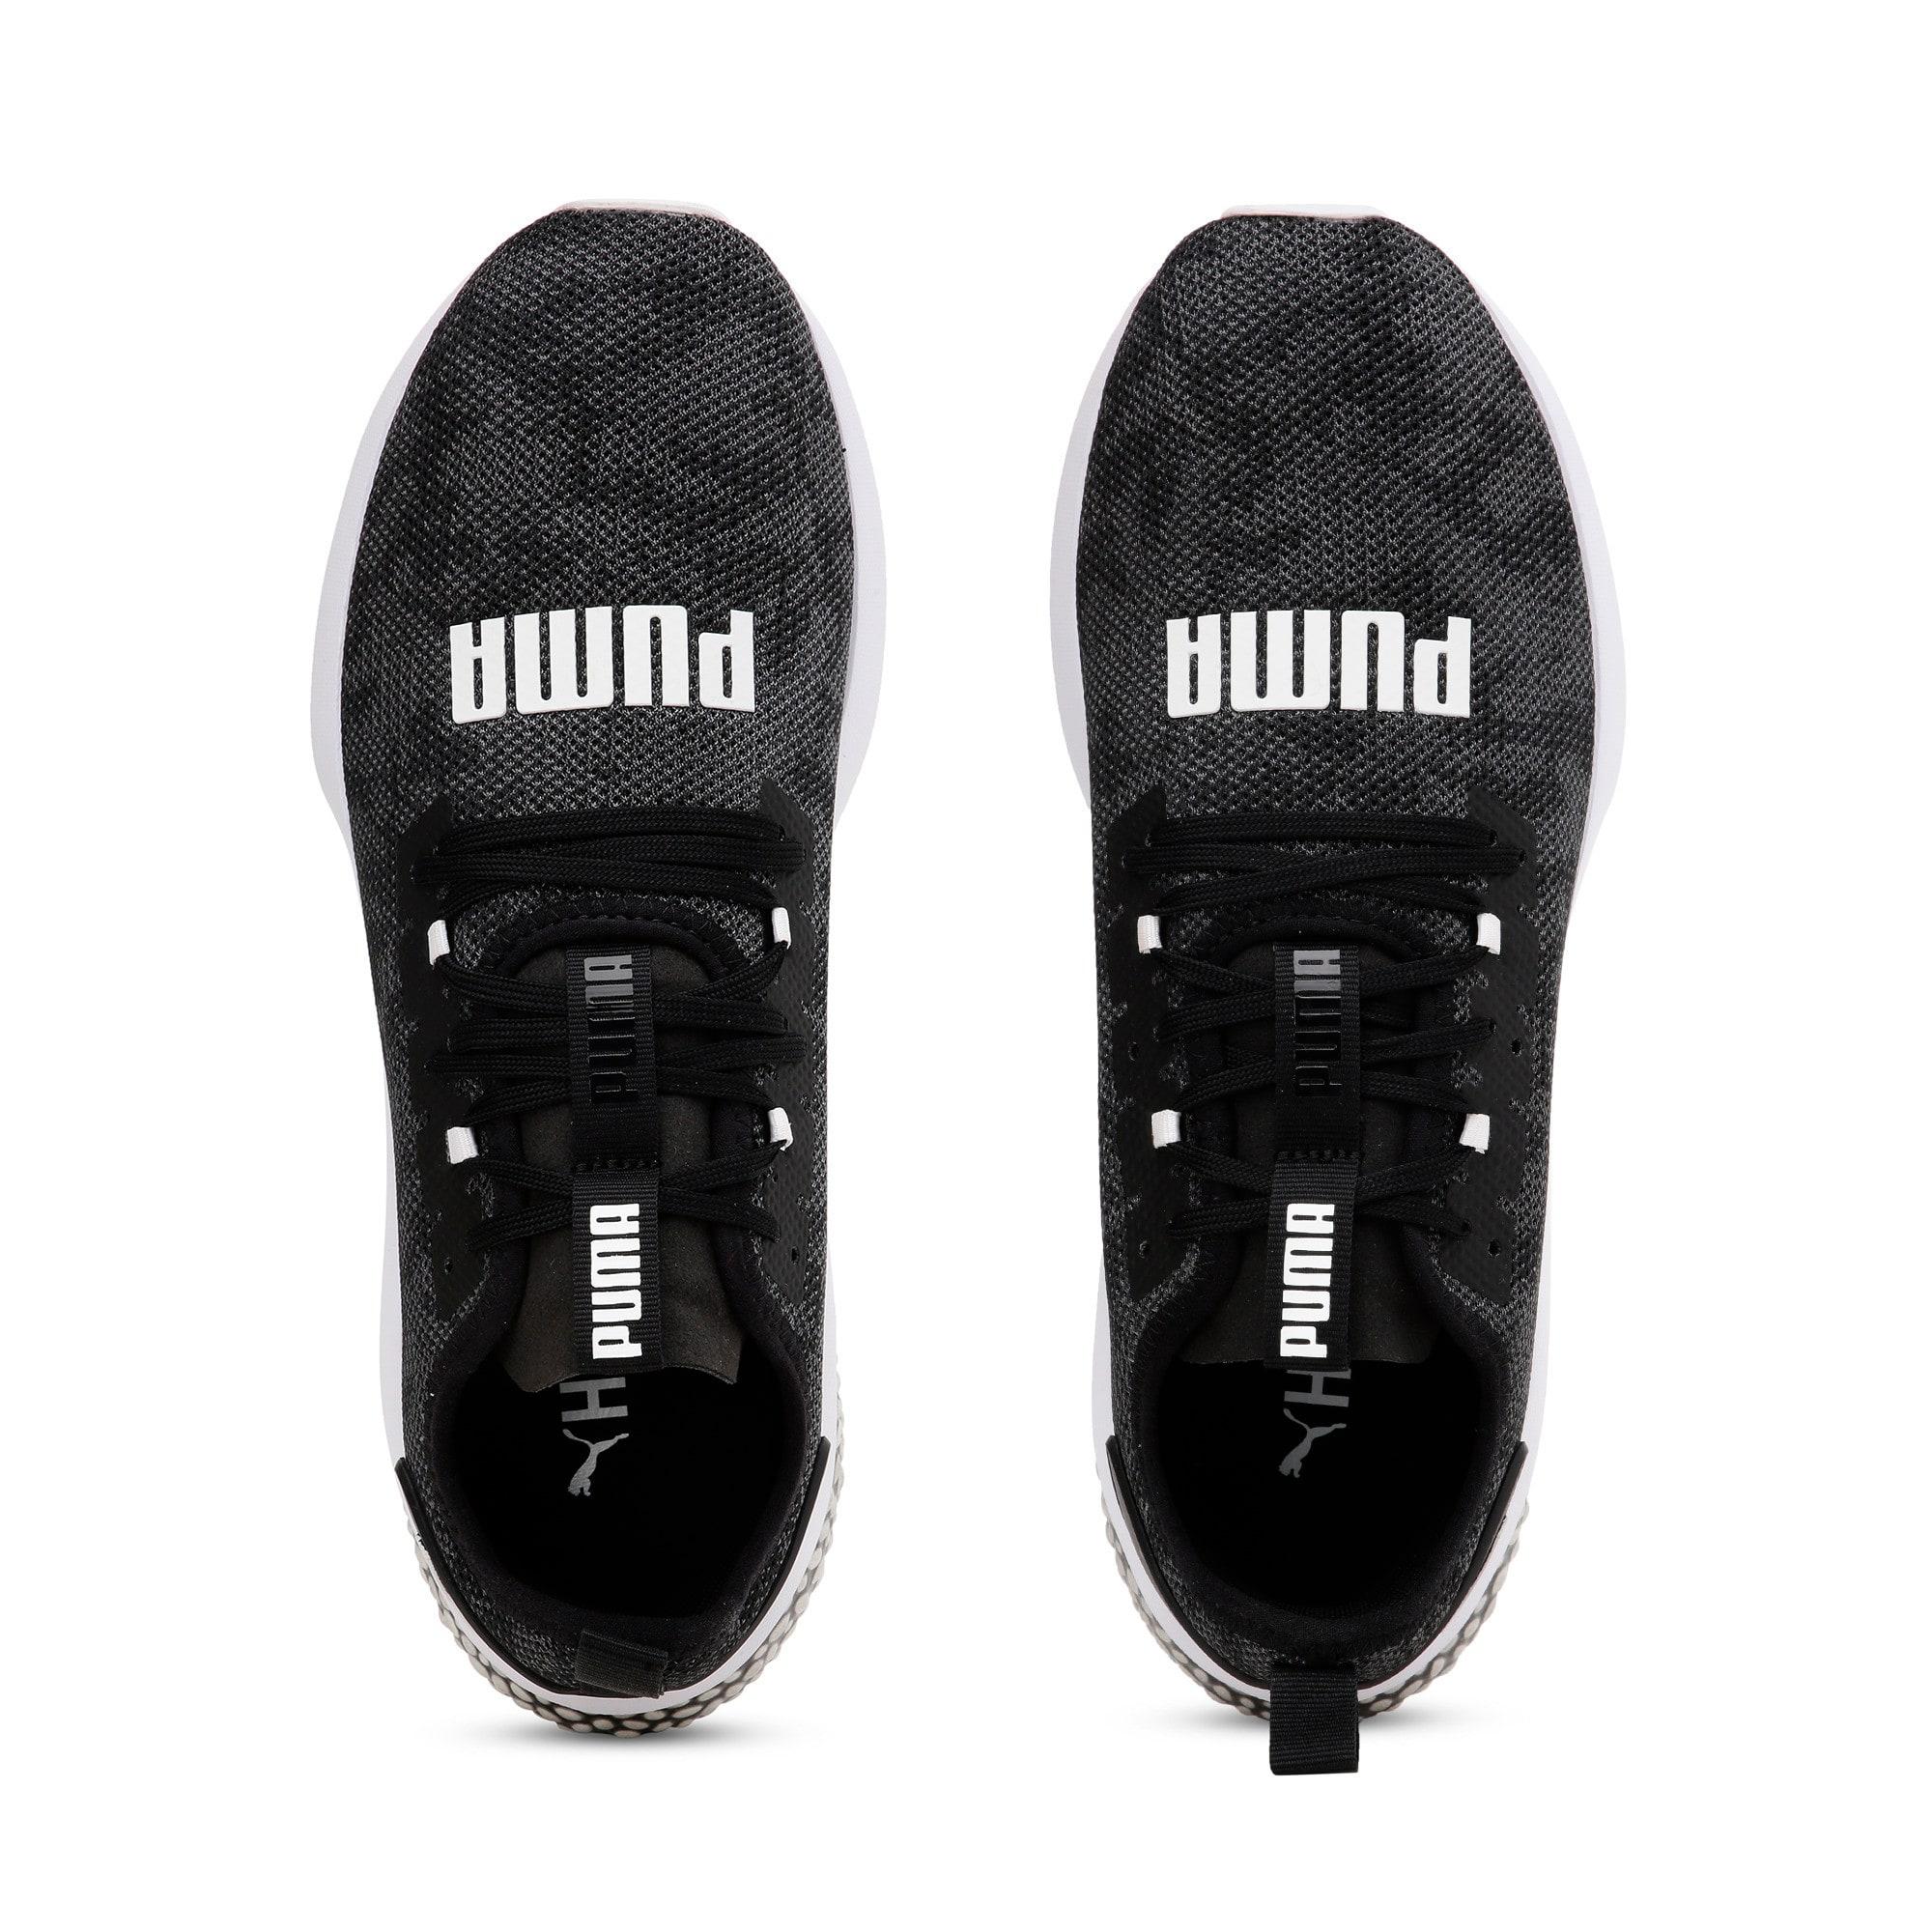 Thumbnail 8 of Hybrid NX Camo Men's Running Sneakers, Puma Black-Puma White, medium-IND